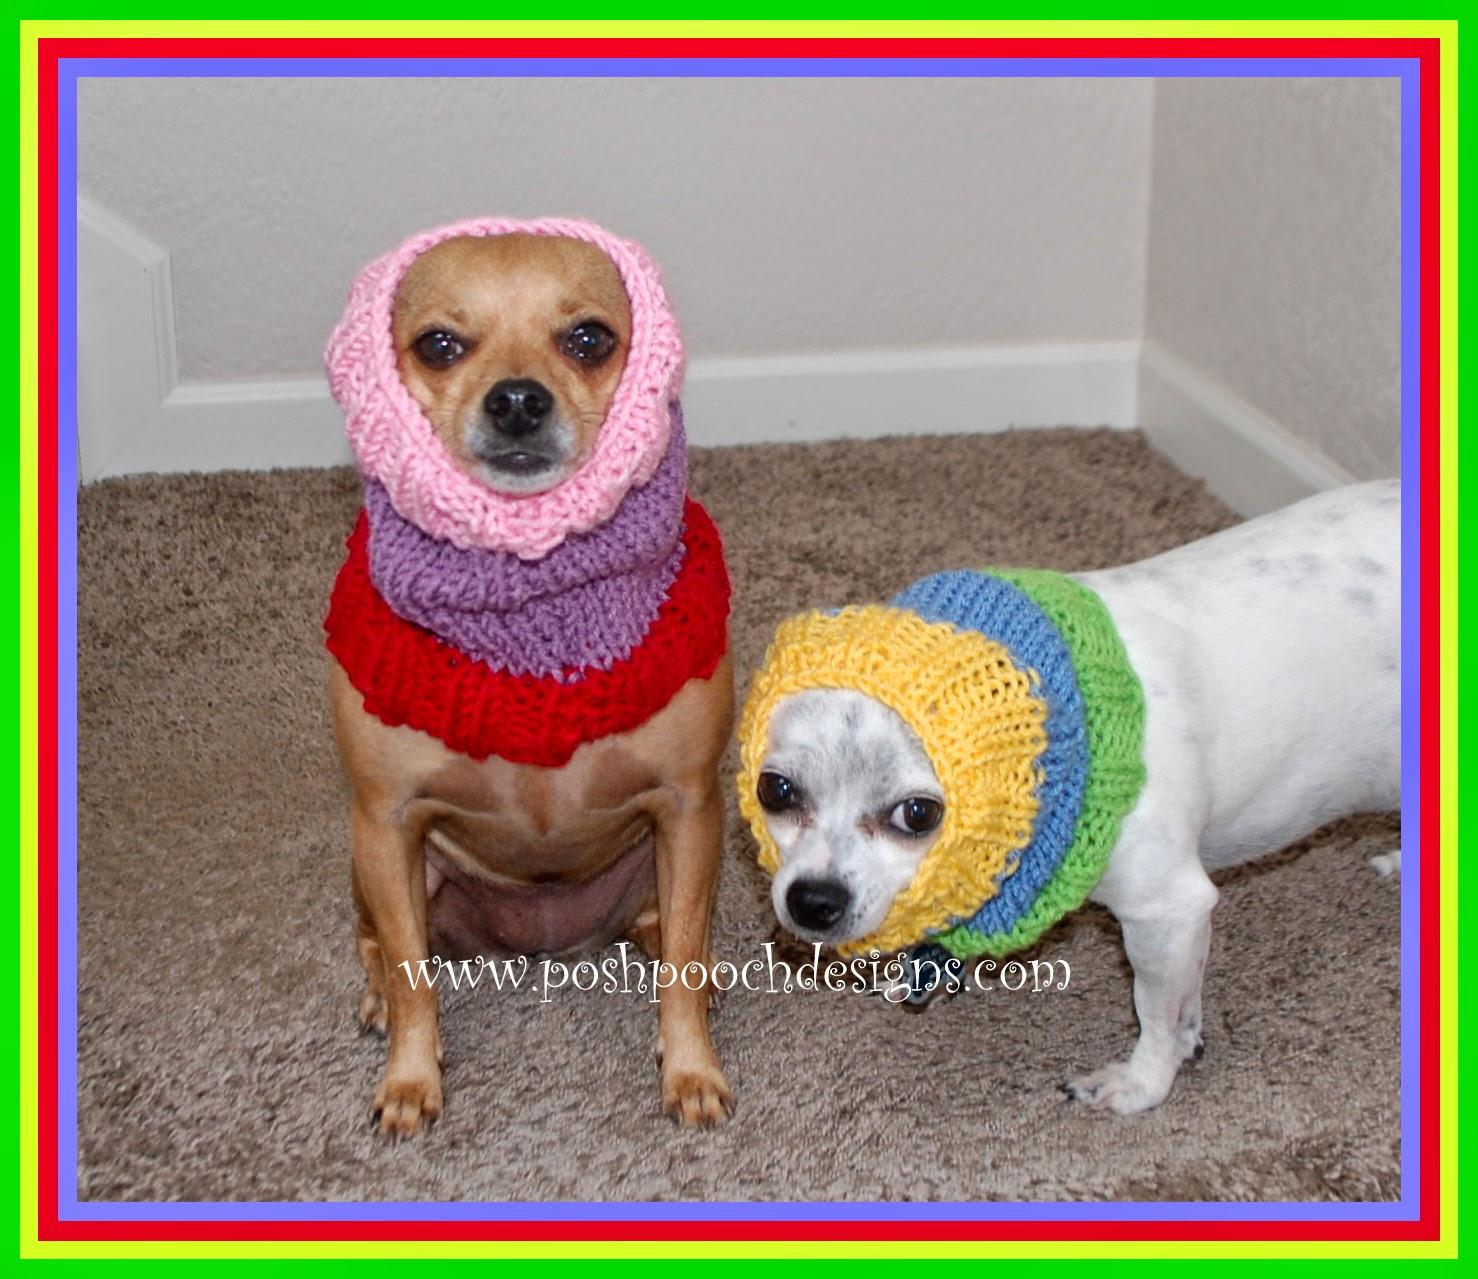 Posh Pooch Designs Dog Clothes: Colors Dog Snood Free Knitting Pattern Posh...